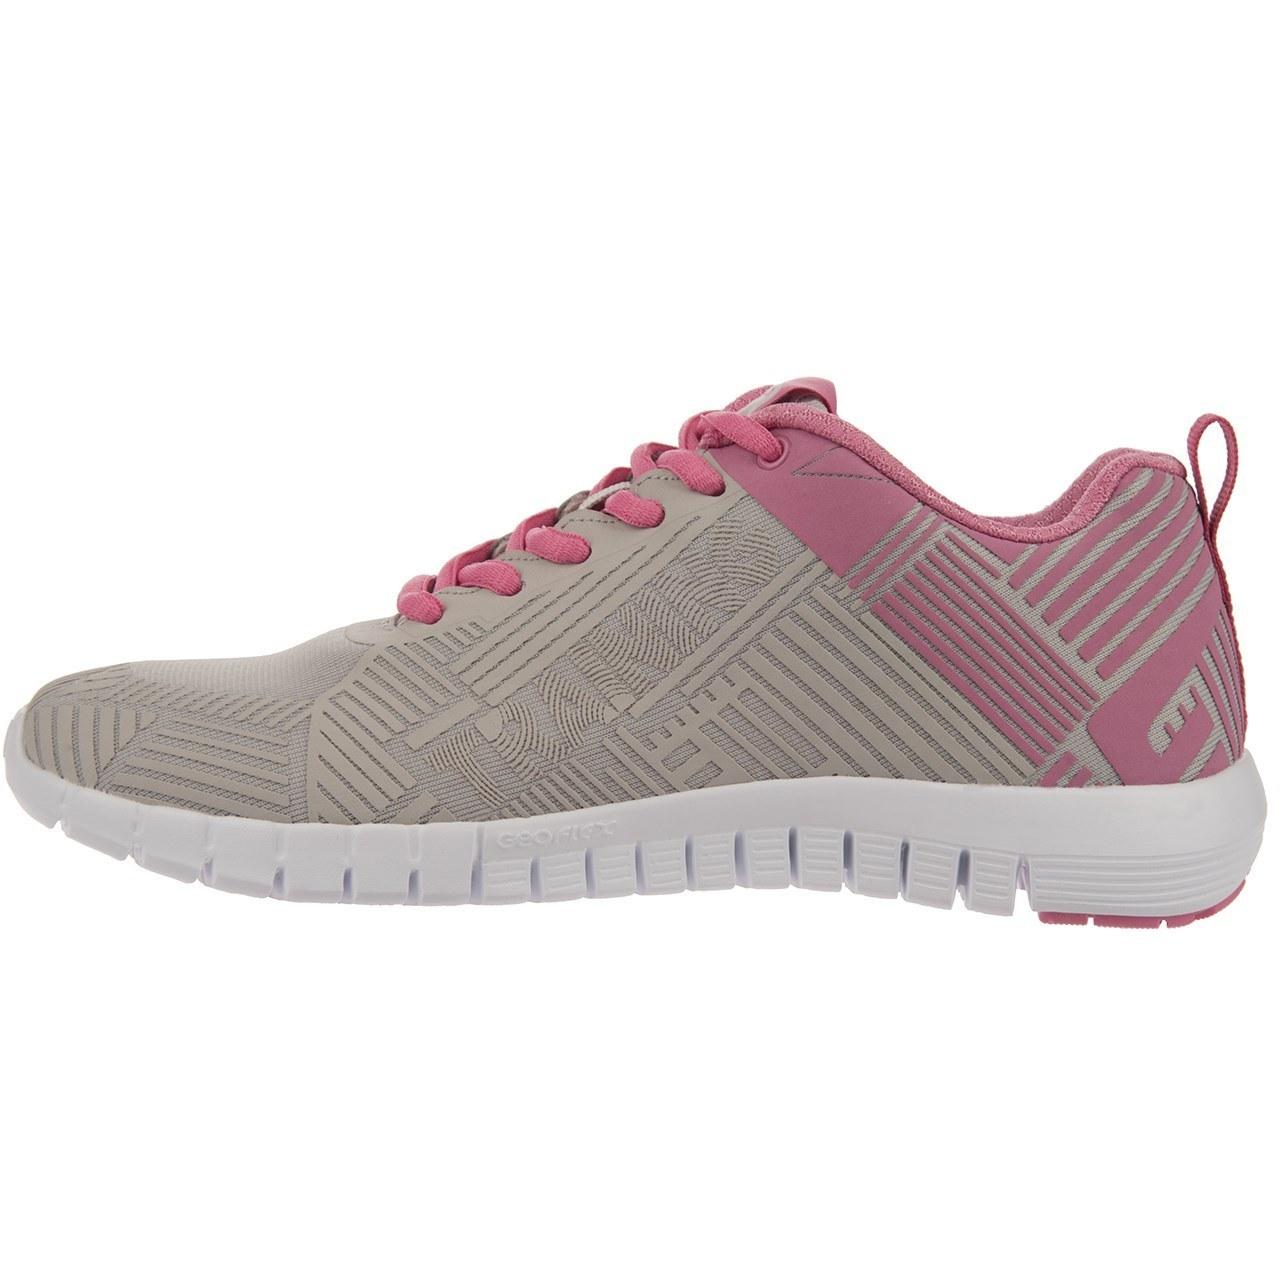 کفش مخصوص دويدن زنانه 361 درجه مدل 24425 | Model 24425 Running Shoes  By 361 Degrees For Women